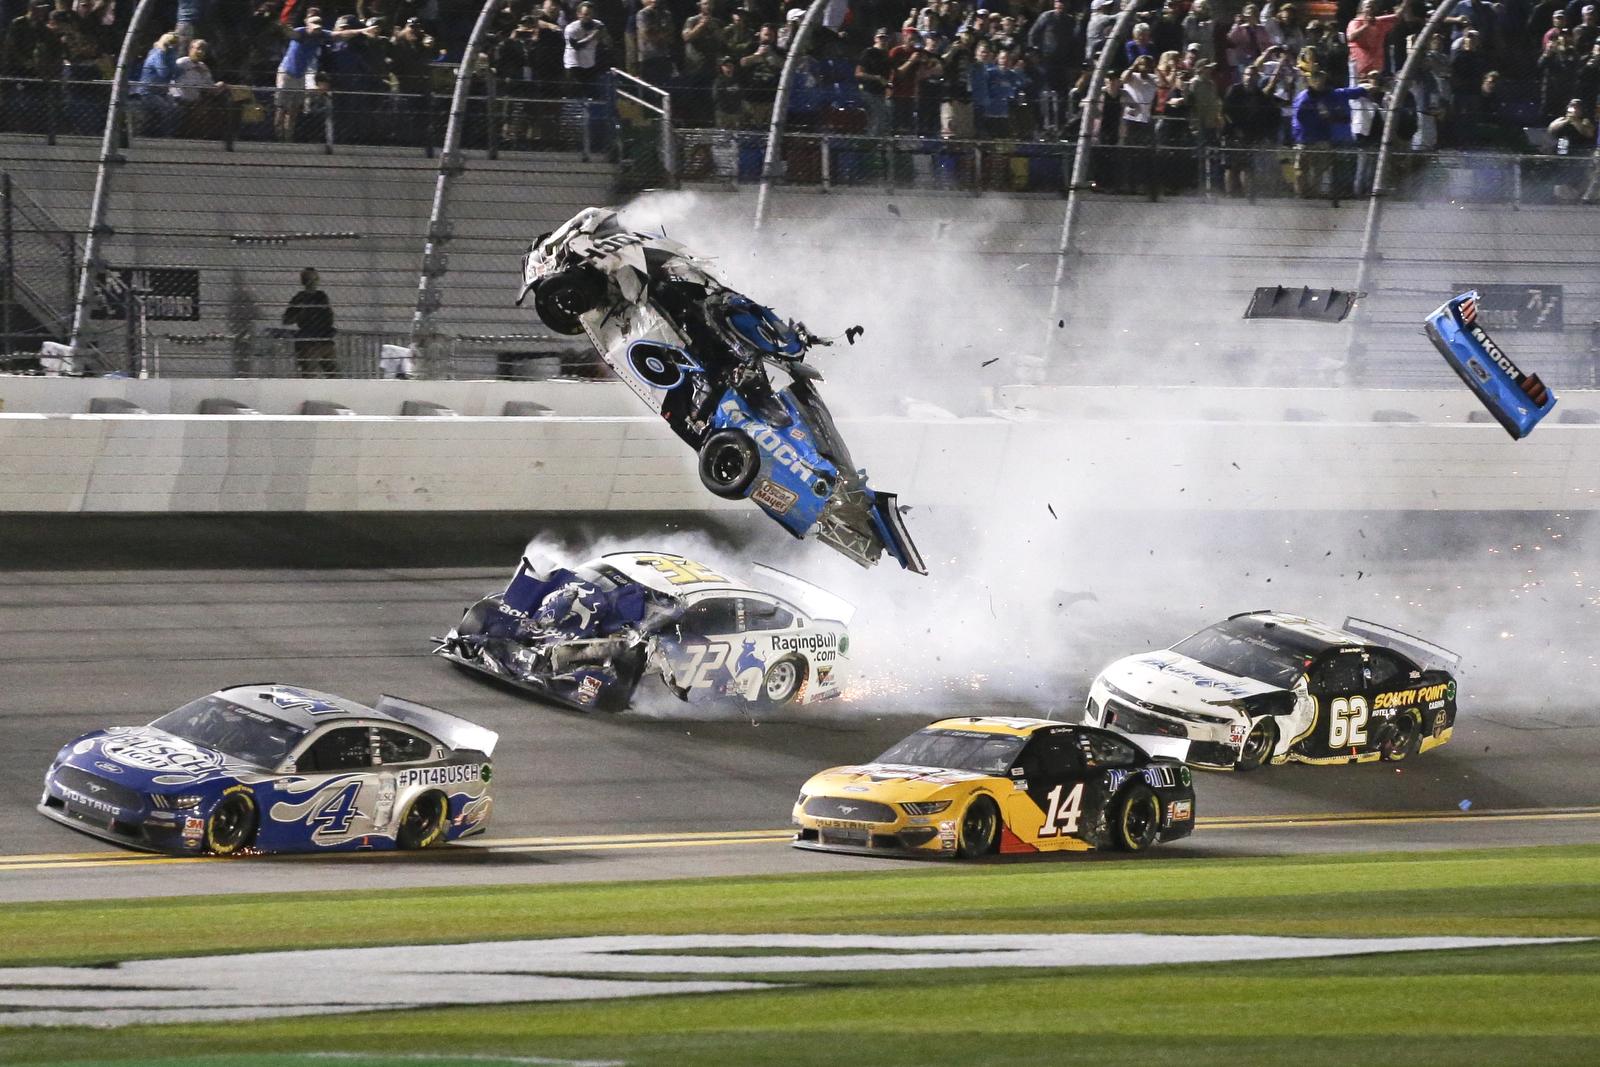 Ryan Newman (6) goes airborne as he collided with Corey LaJoie (32) on the final lap of the NASCAR Daytona 500 auto race at Daytona International Speedway, Monday, Feb. 17, 2020, in Daytona Beach, Fla. Sunday's race was postponed because of rain. AP